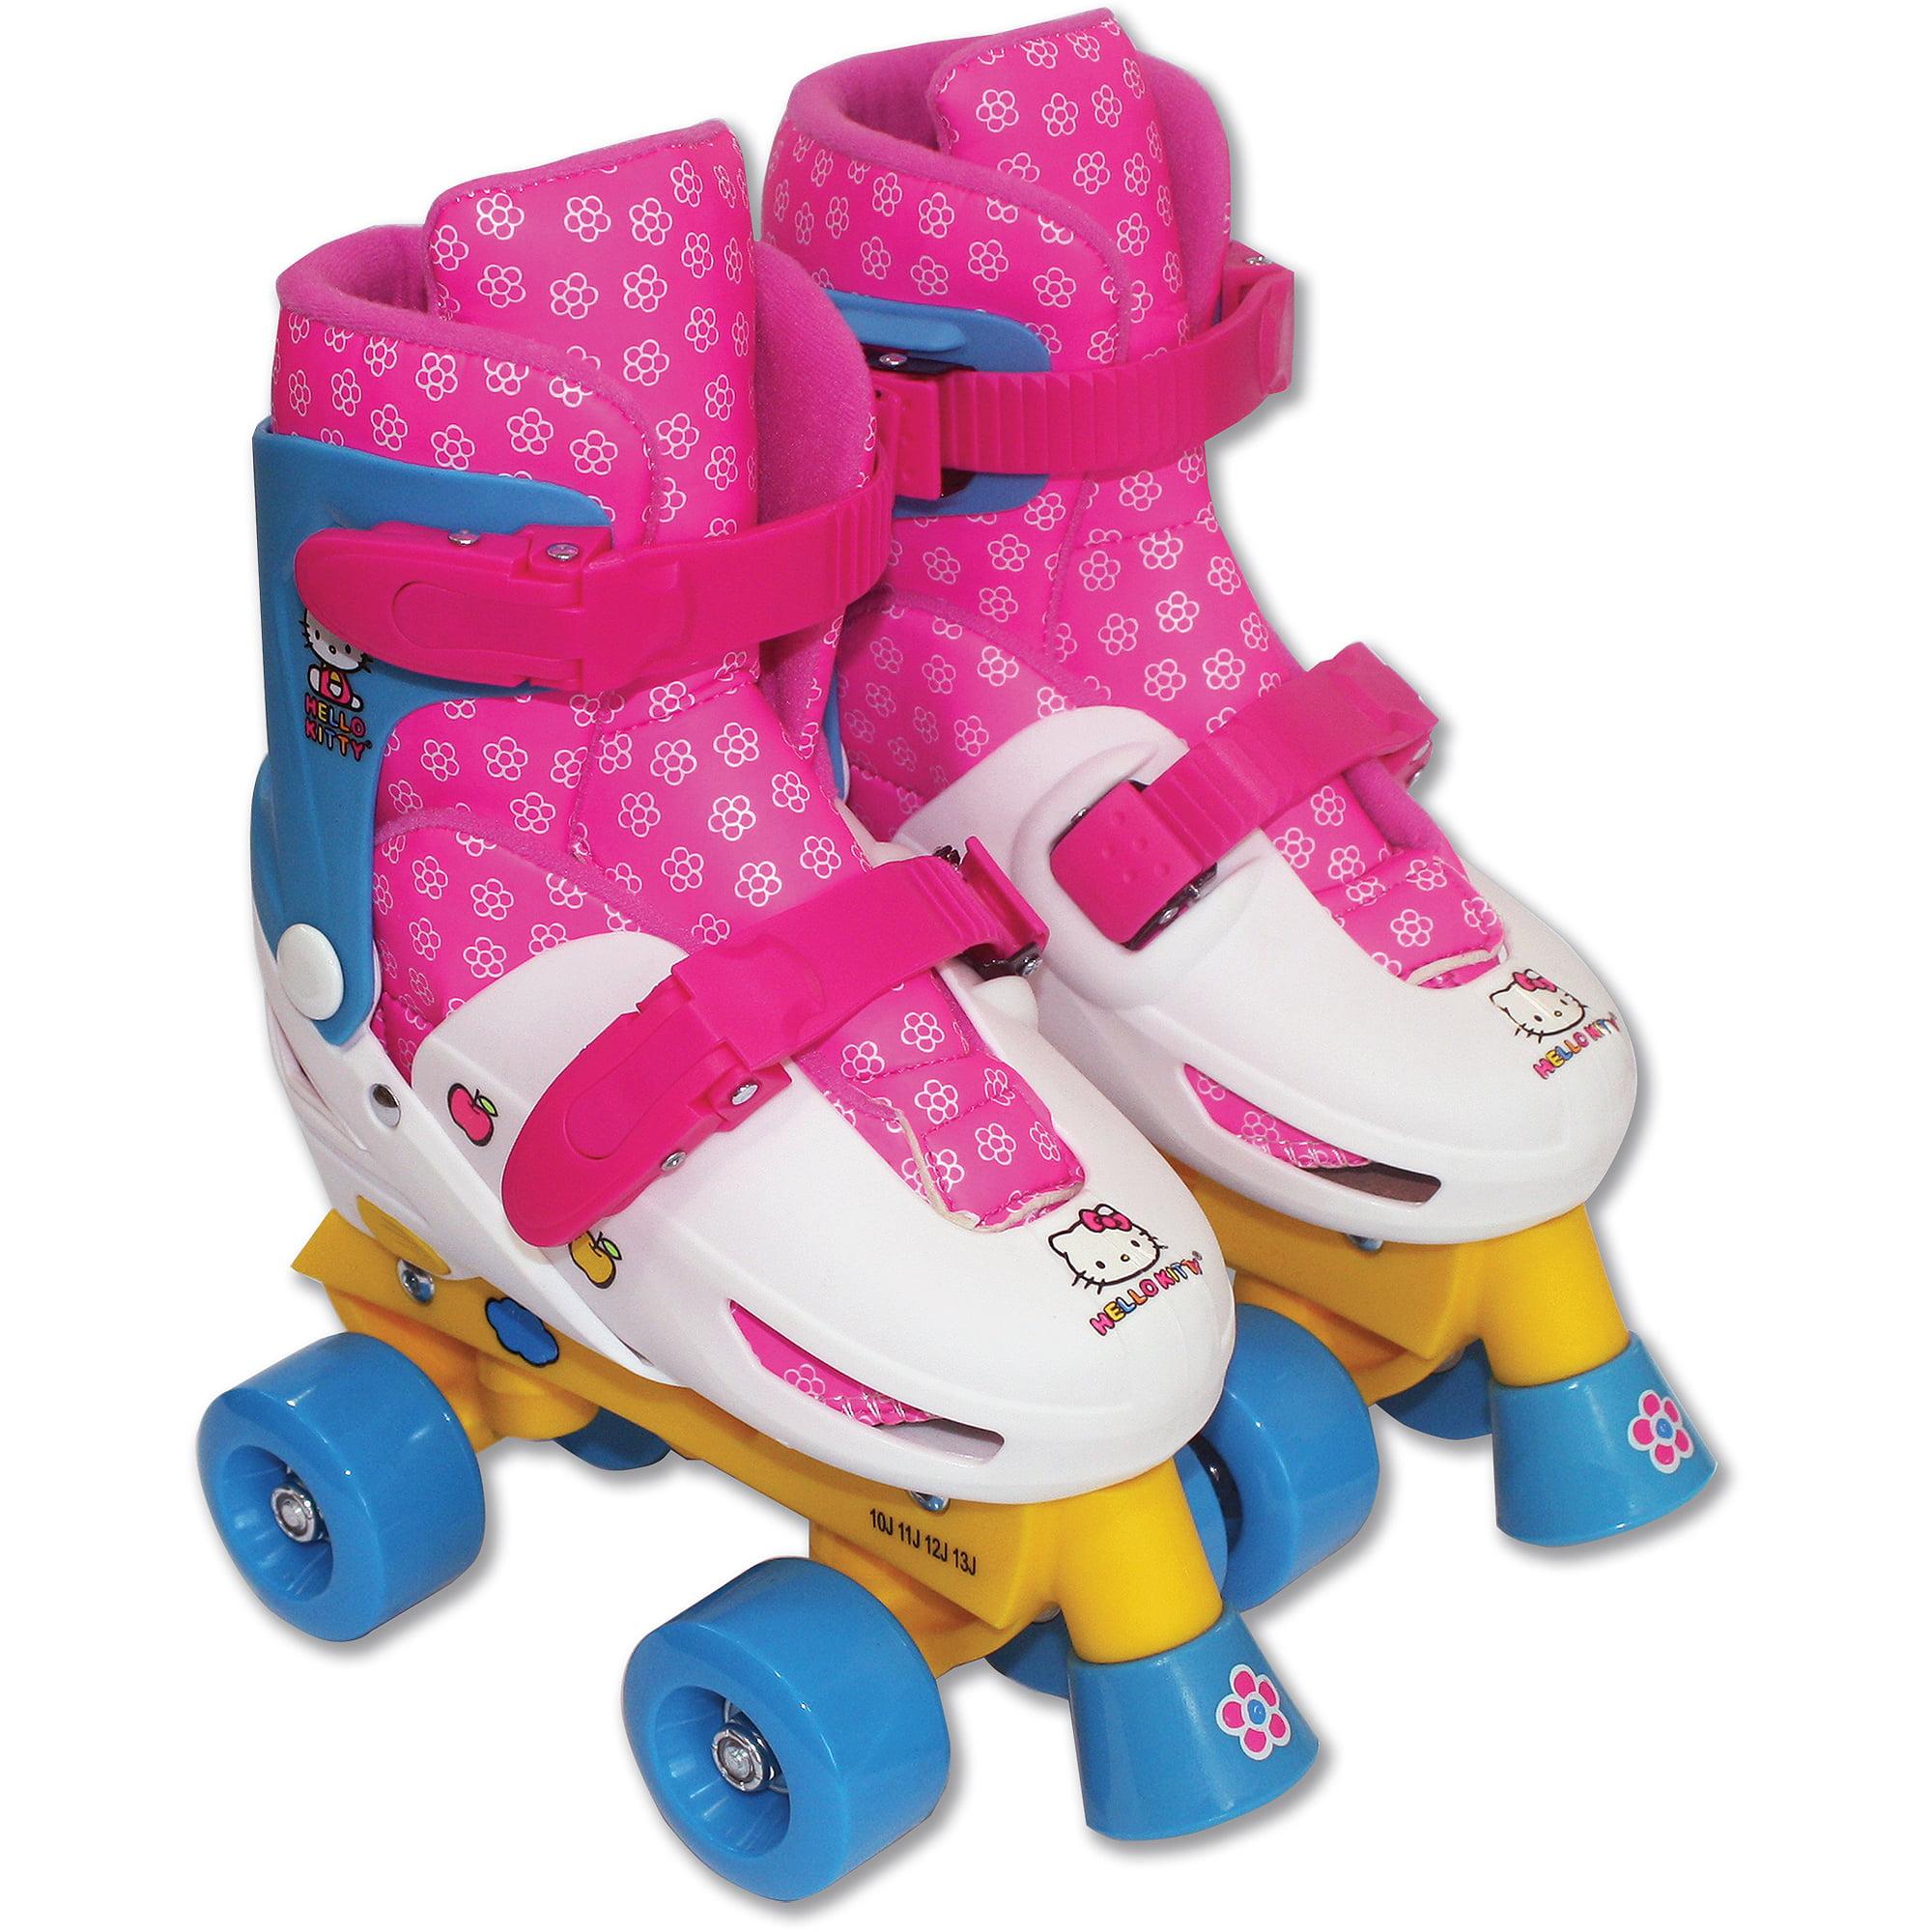 Roller shoes walmart - Roller Shoes Walmart 15